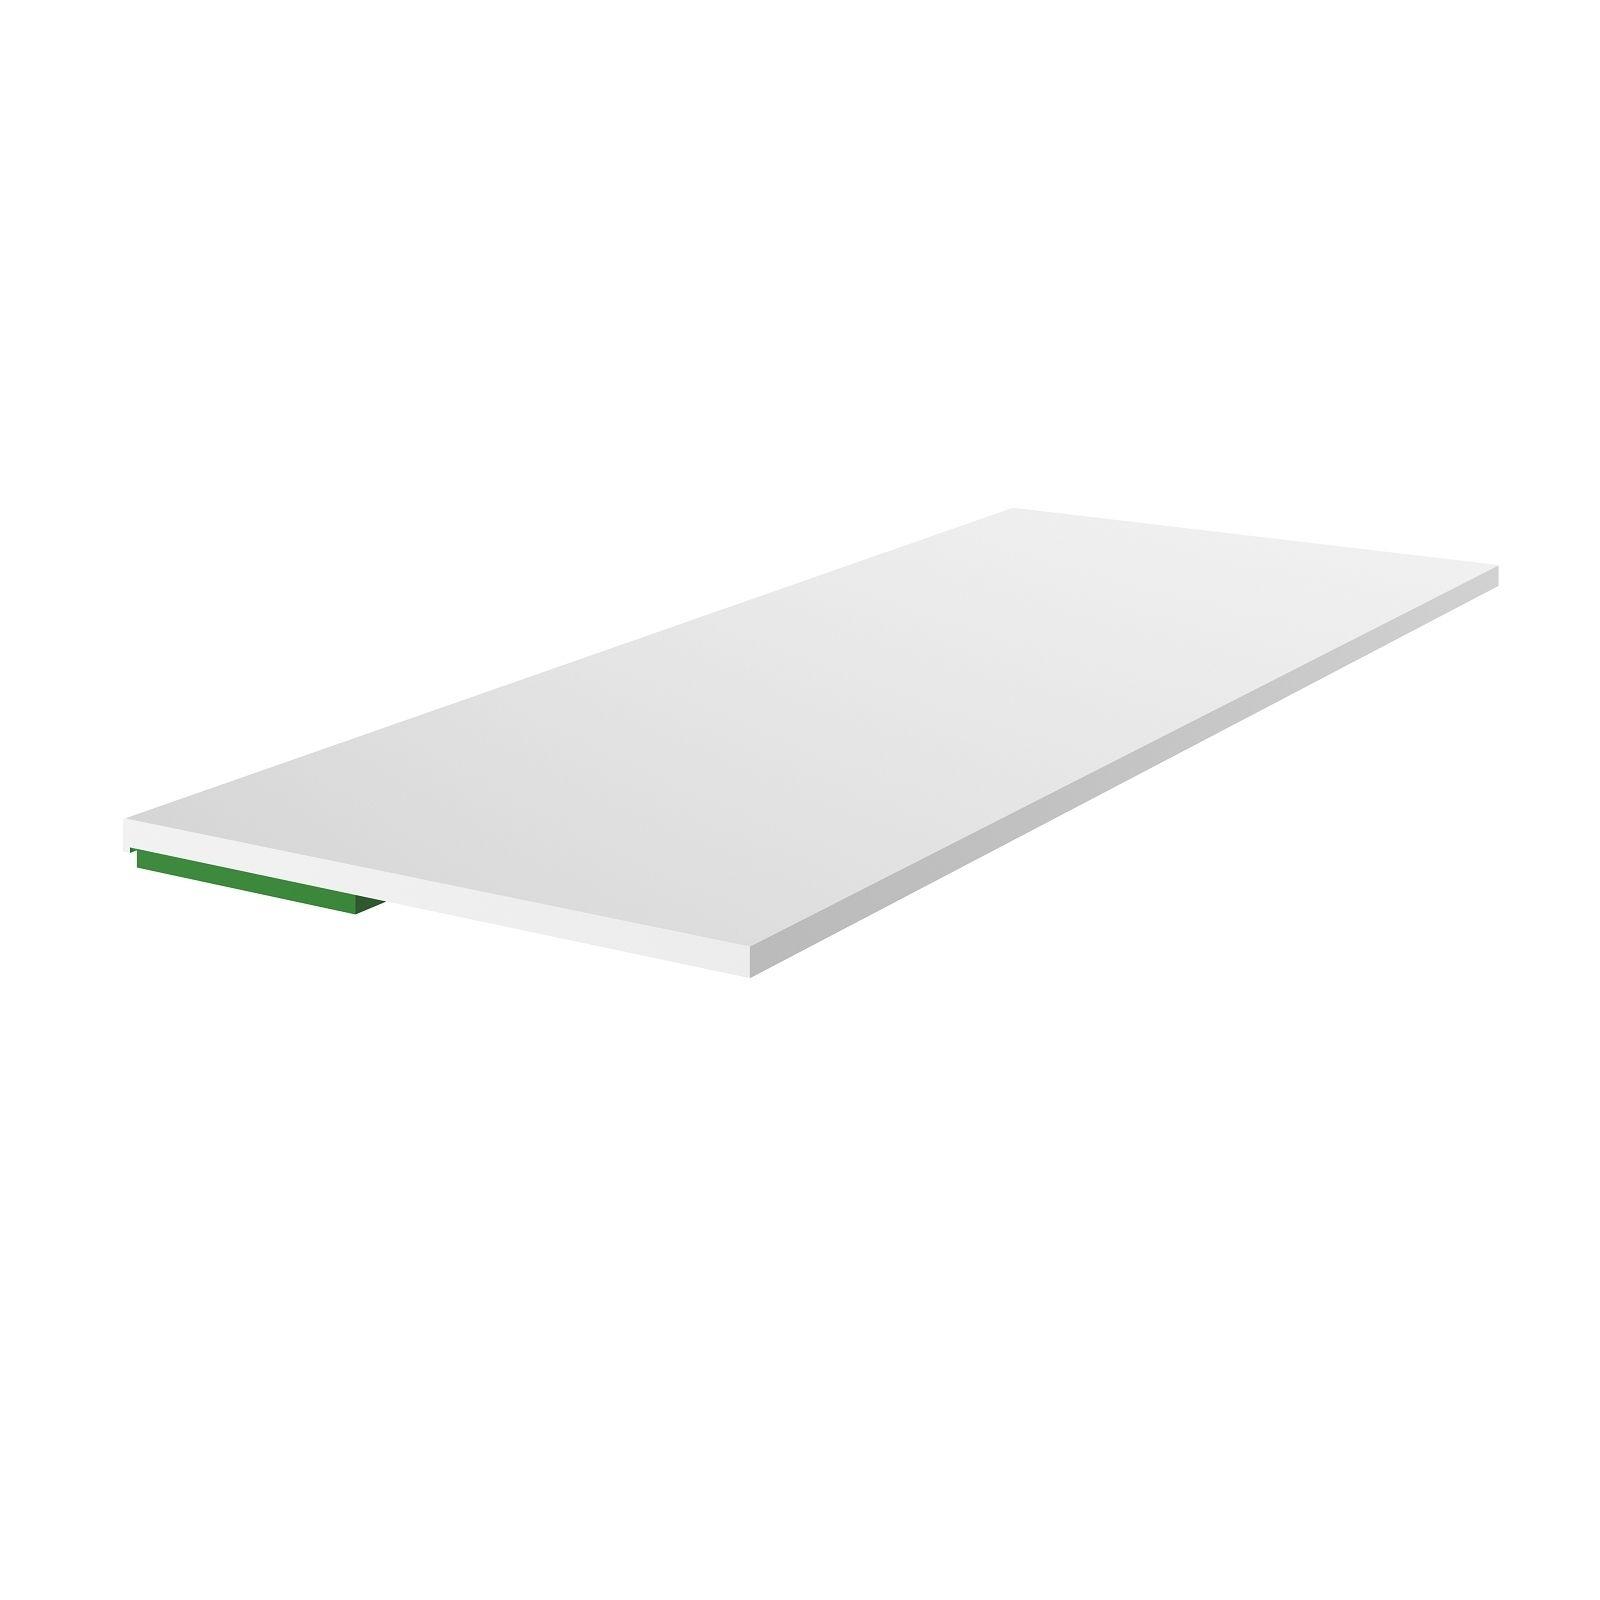 """1,09€/m"" 10m Abdeckleiste Flachleiste Fensterleiste PVC-Leiste Rolle 30mm"